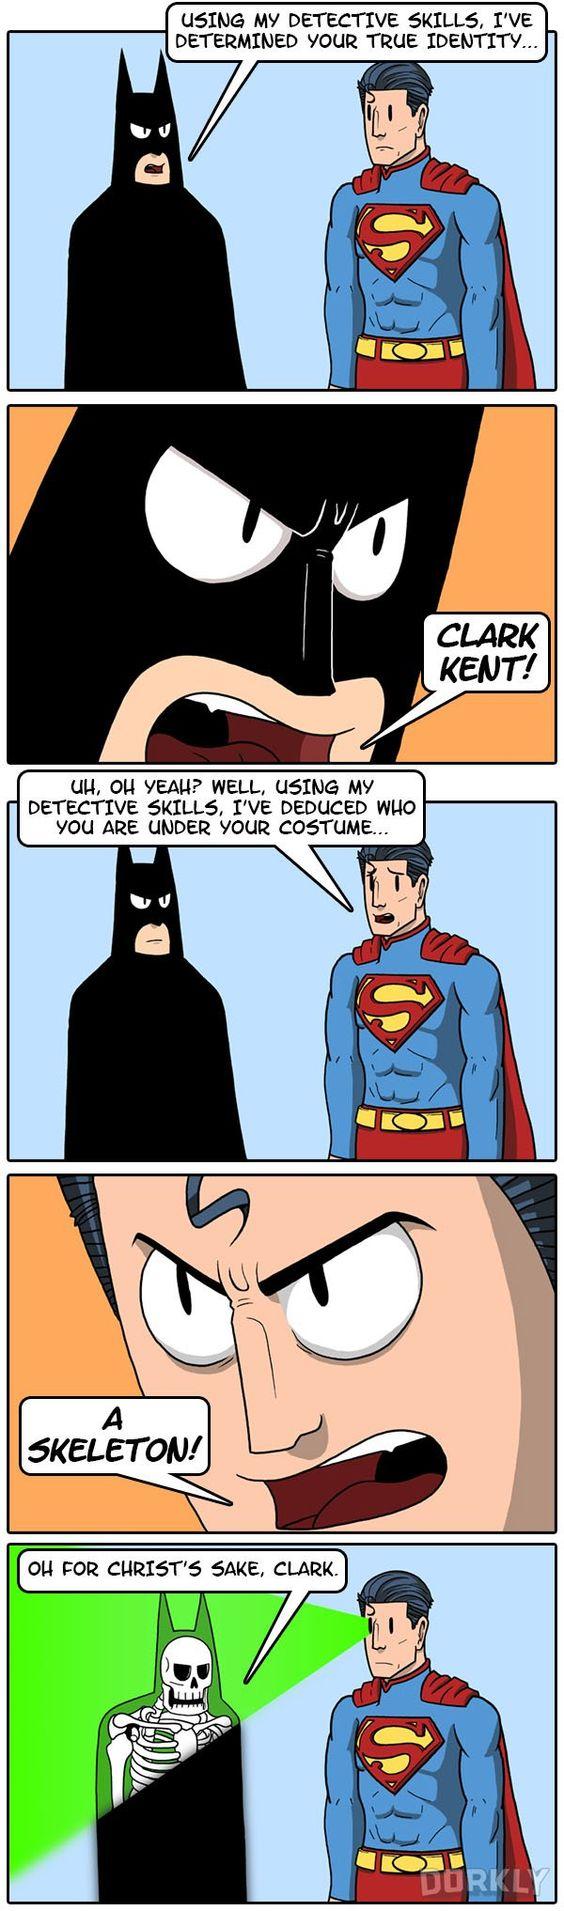 batman-vs-superman-true-identity-comic-strip